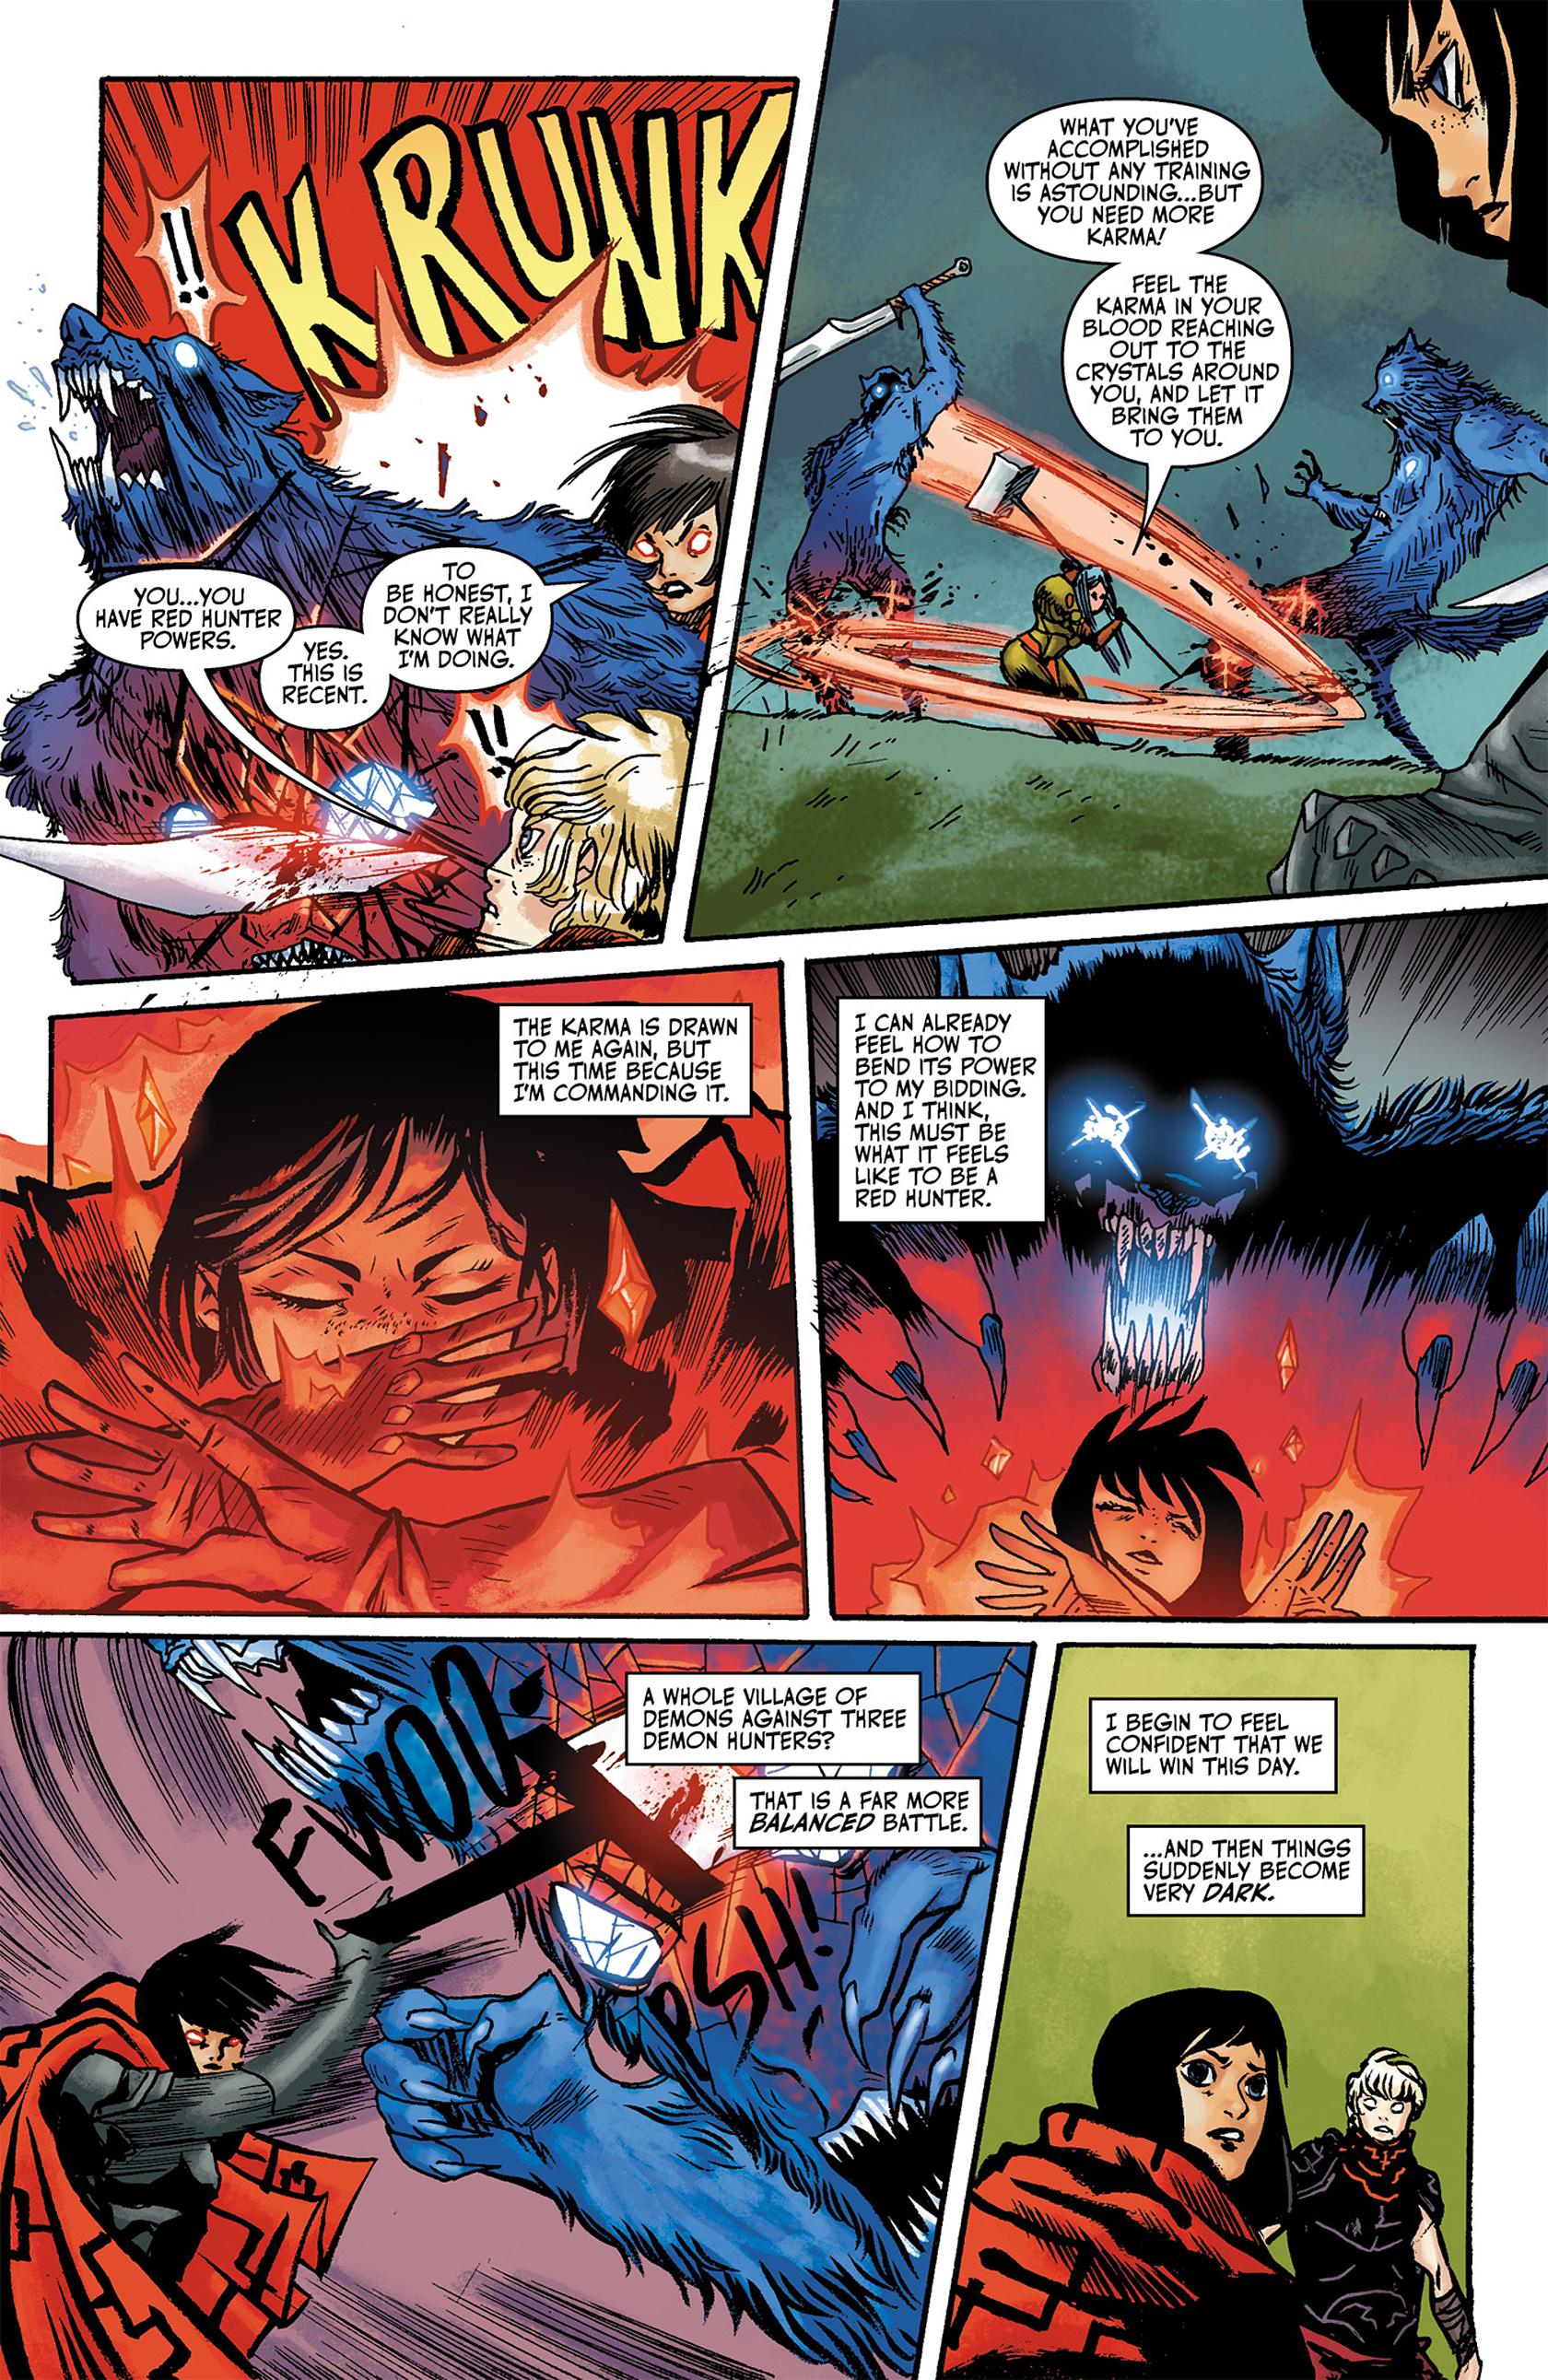 Read online Akaneiro comic -  Issue #3 - 11